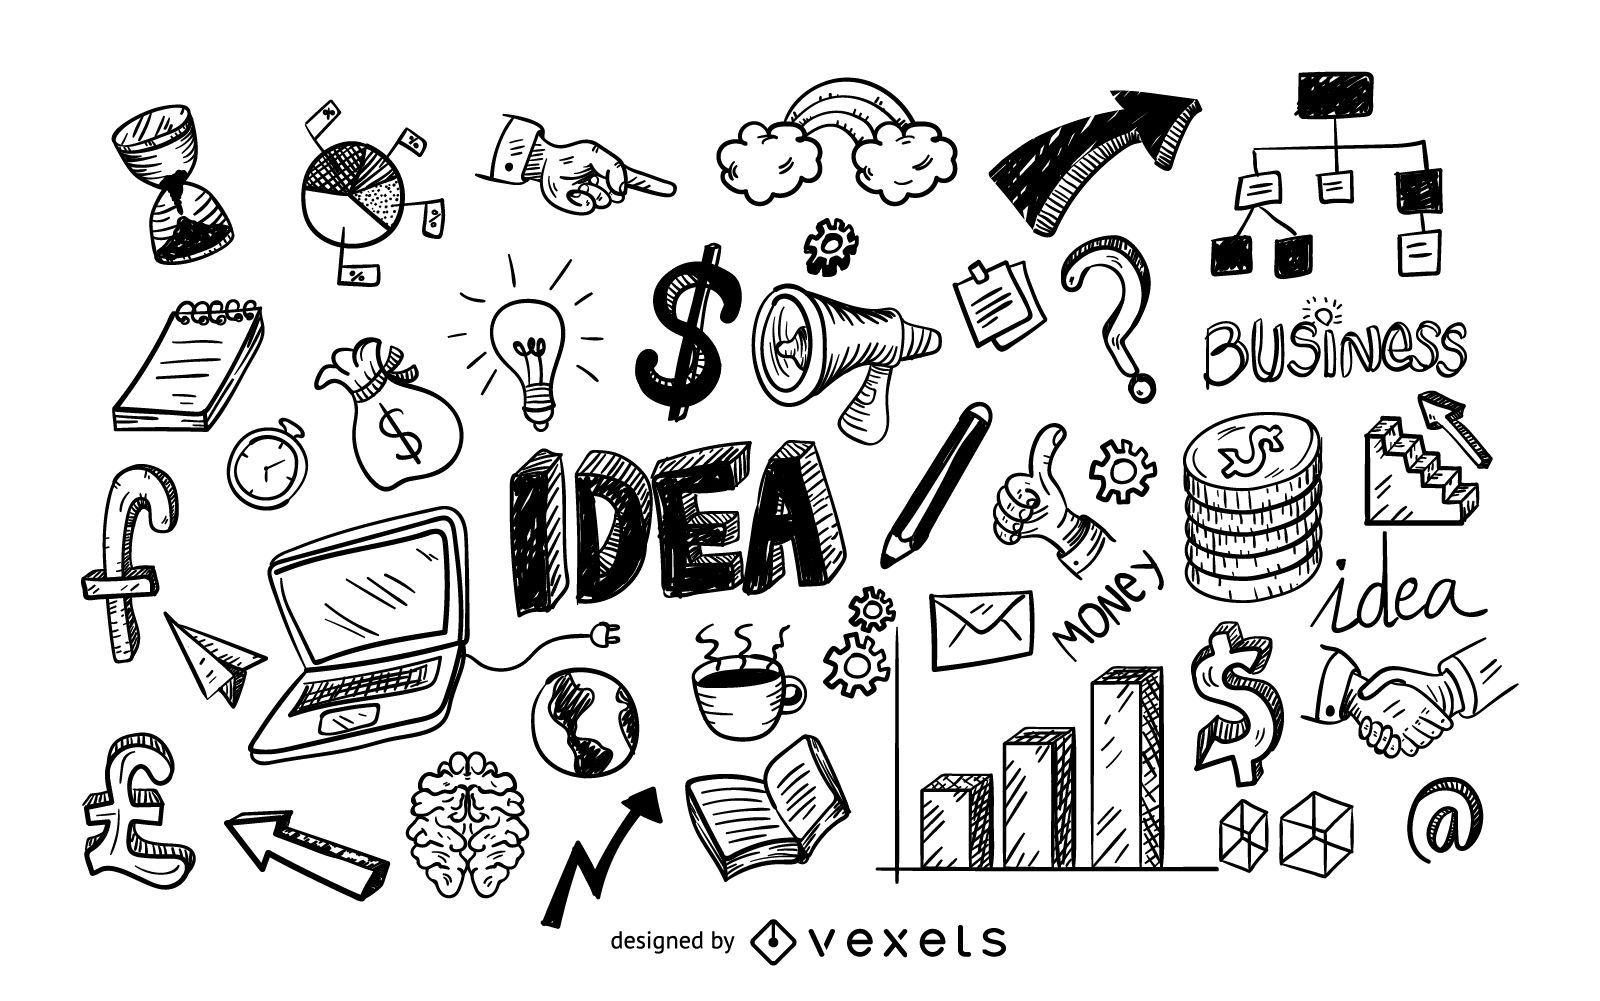 Business icons doodle set